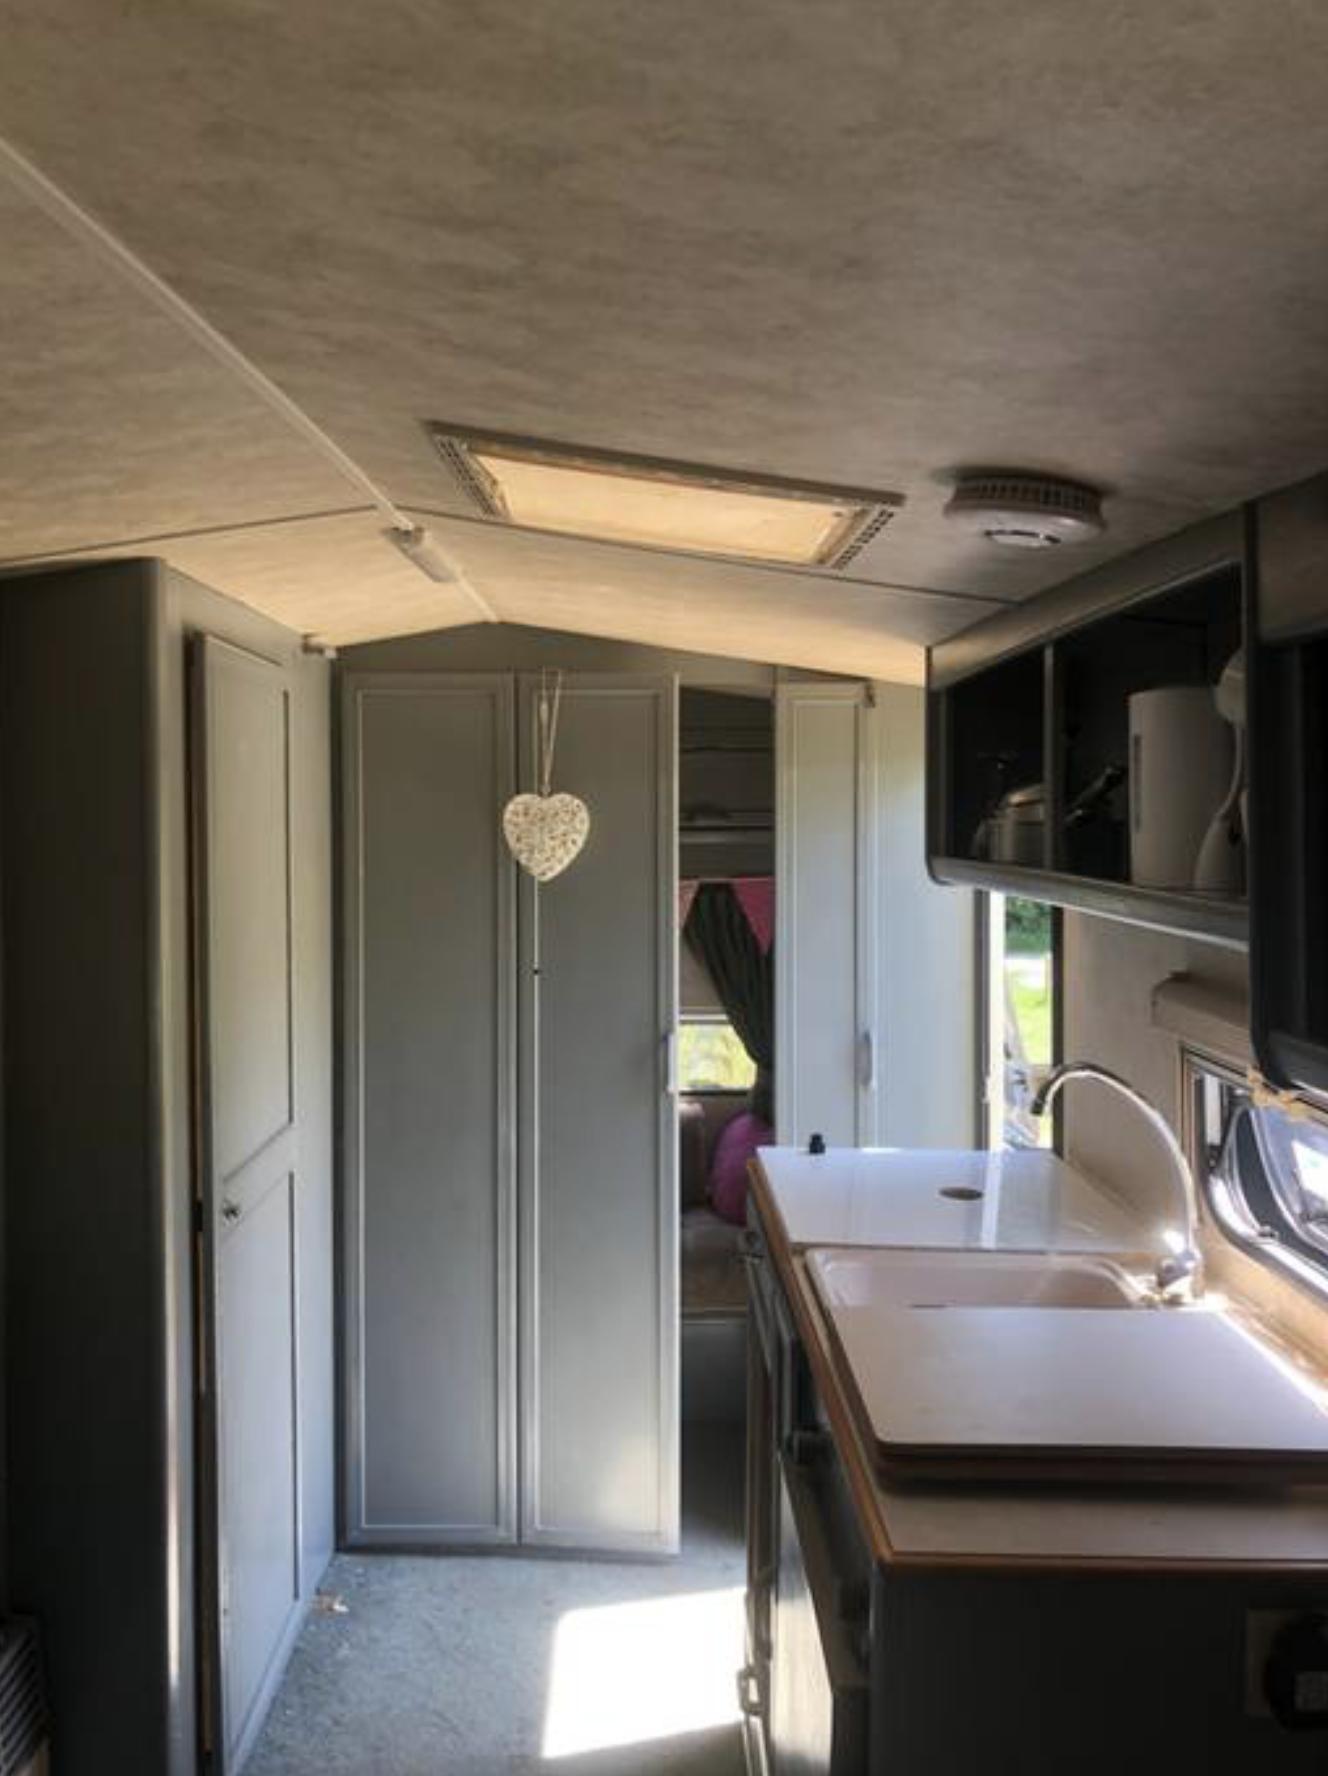 Paryfield Dorset Retro Caravan 5.png